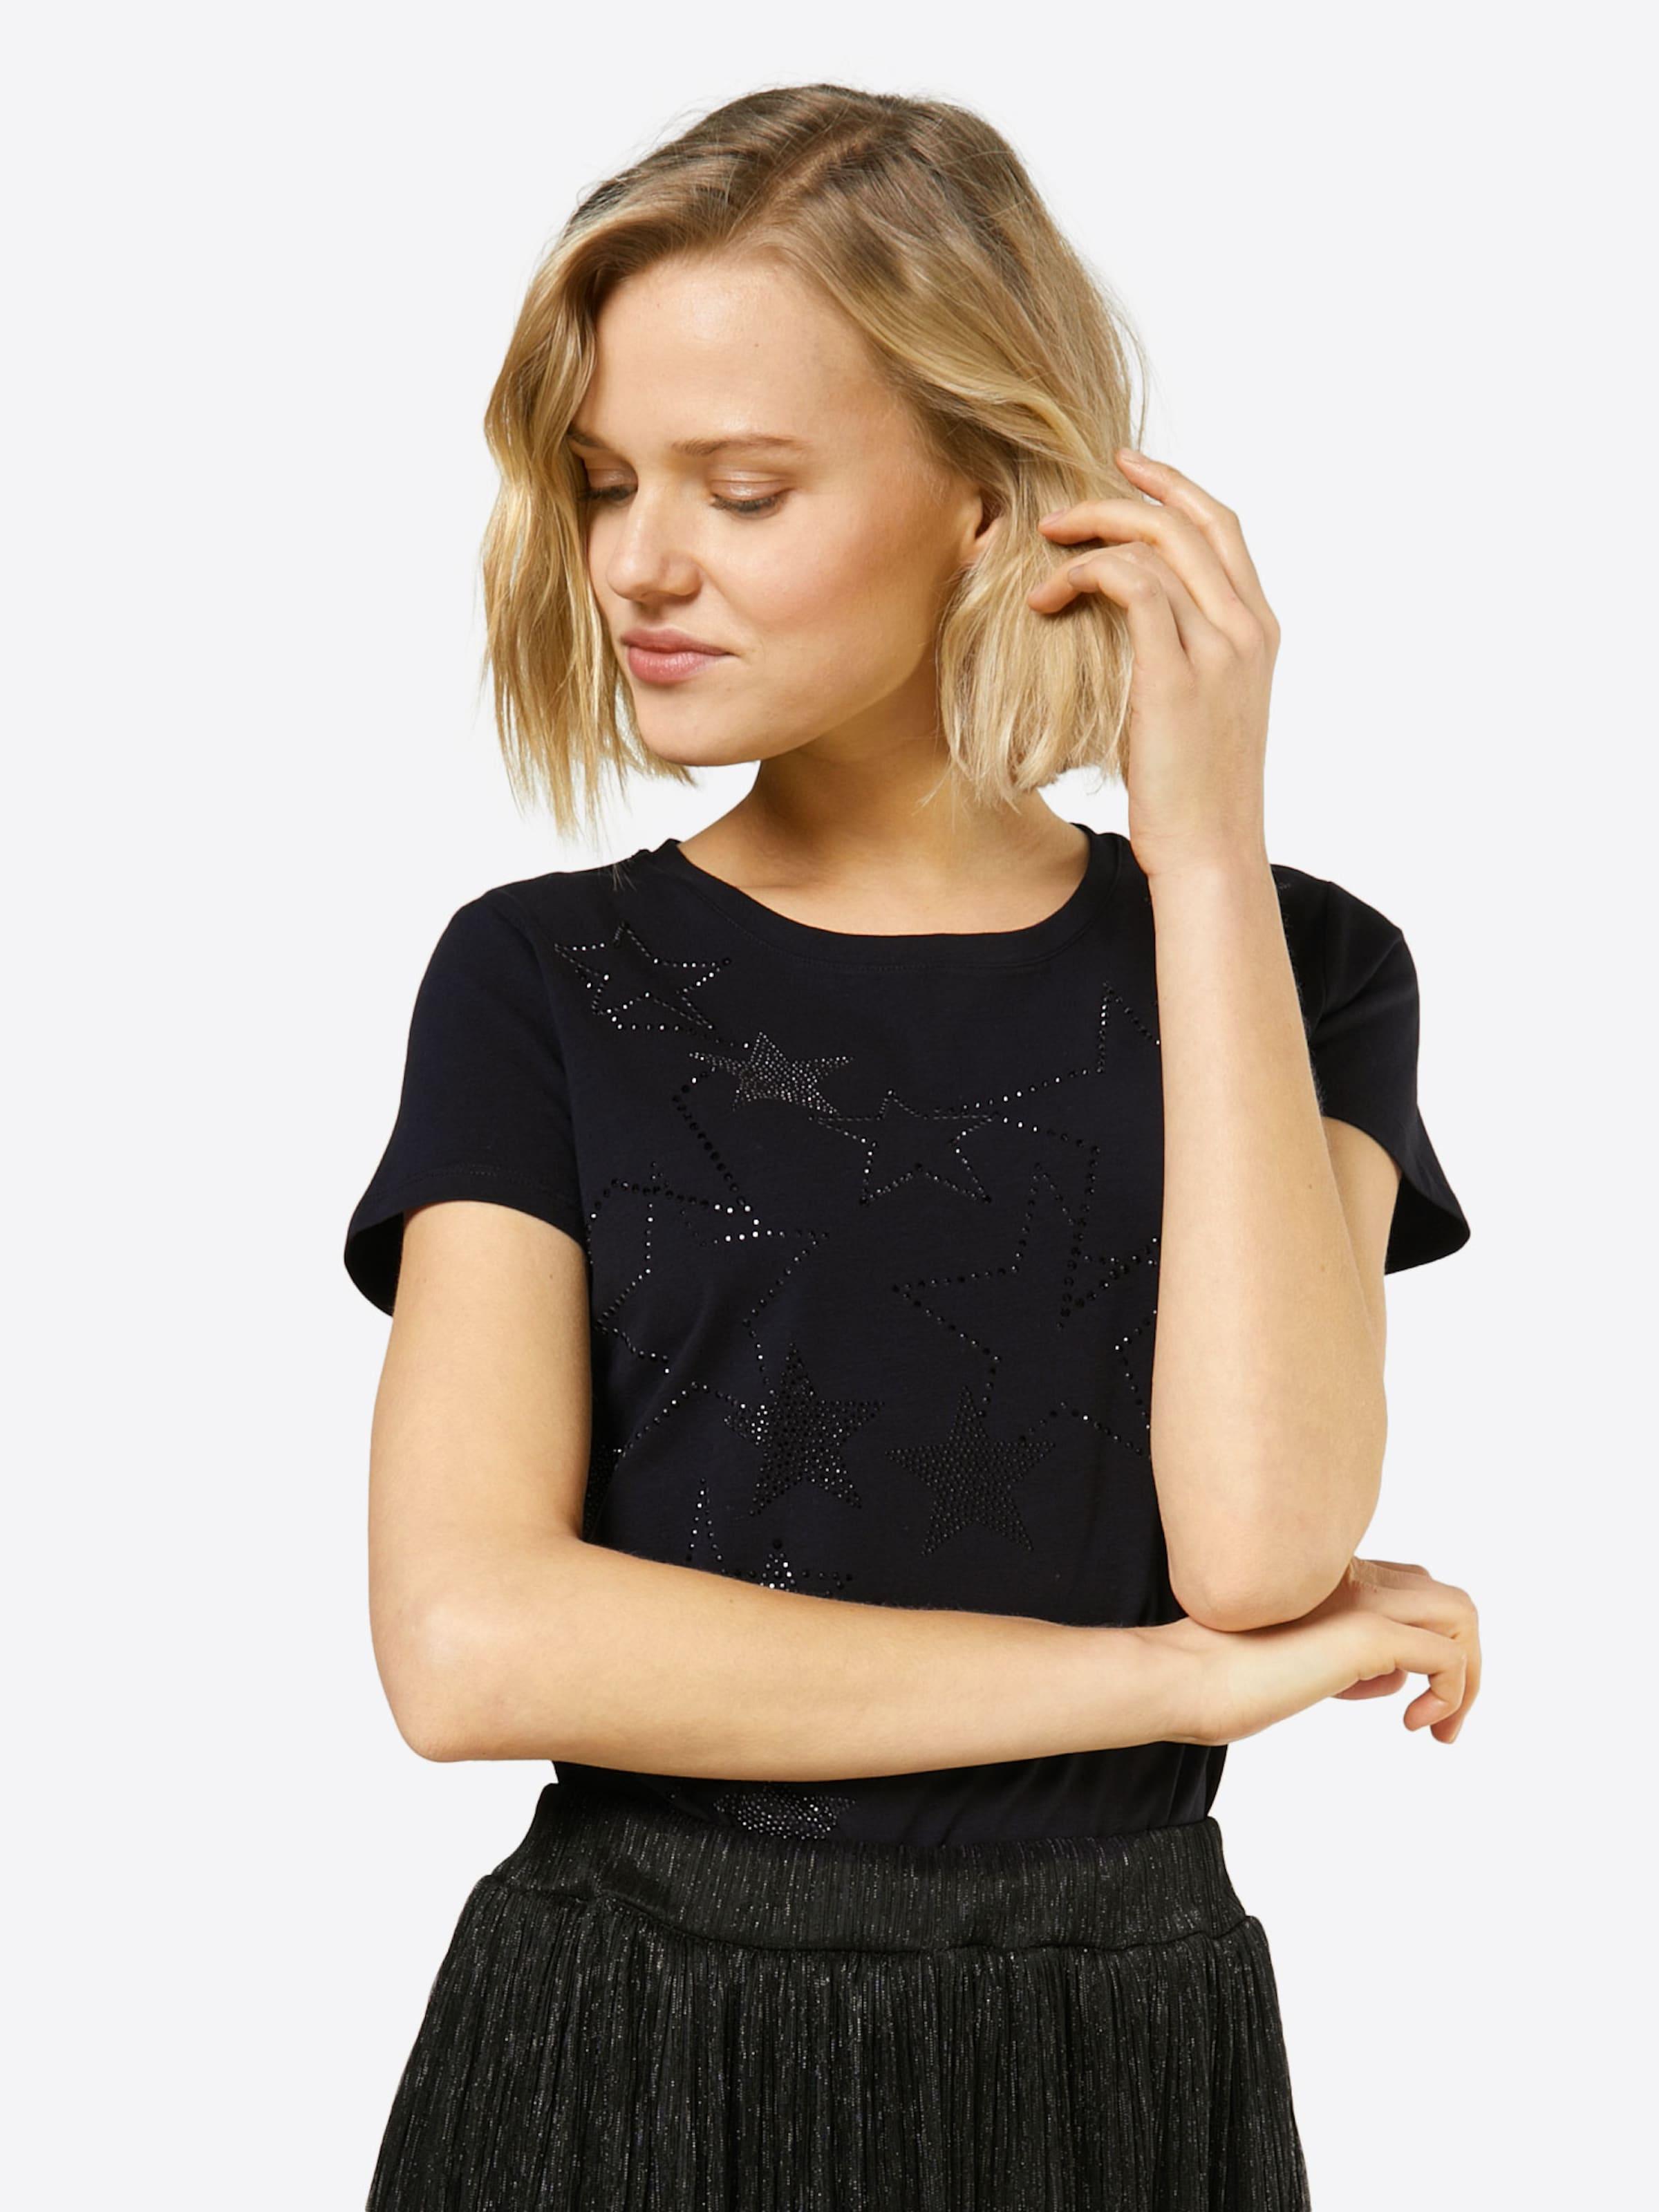 Spielraum Store Niedrigsten Preis Online LIU JO JEANS T-Shirt 'angelie stell' Rabatt Wahl Steckdose Footaction Outlet Beste Geschäft Zu Bekommen isEg6